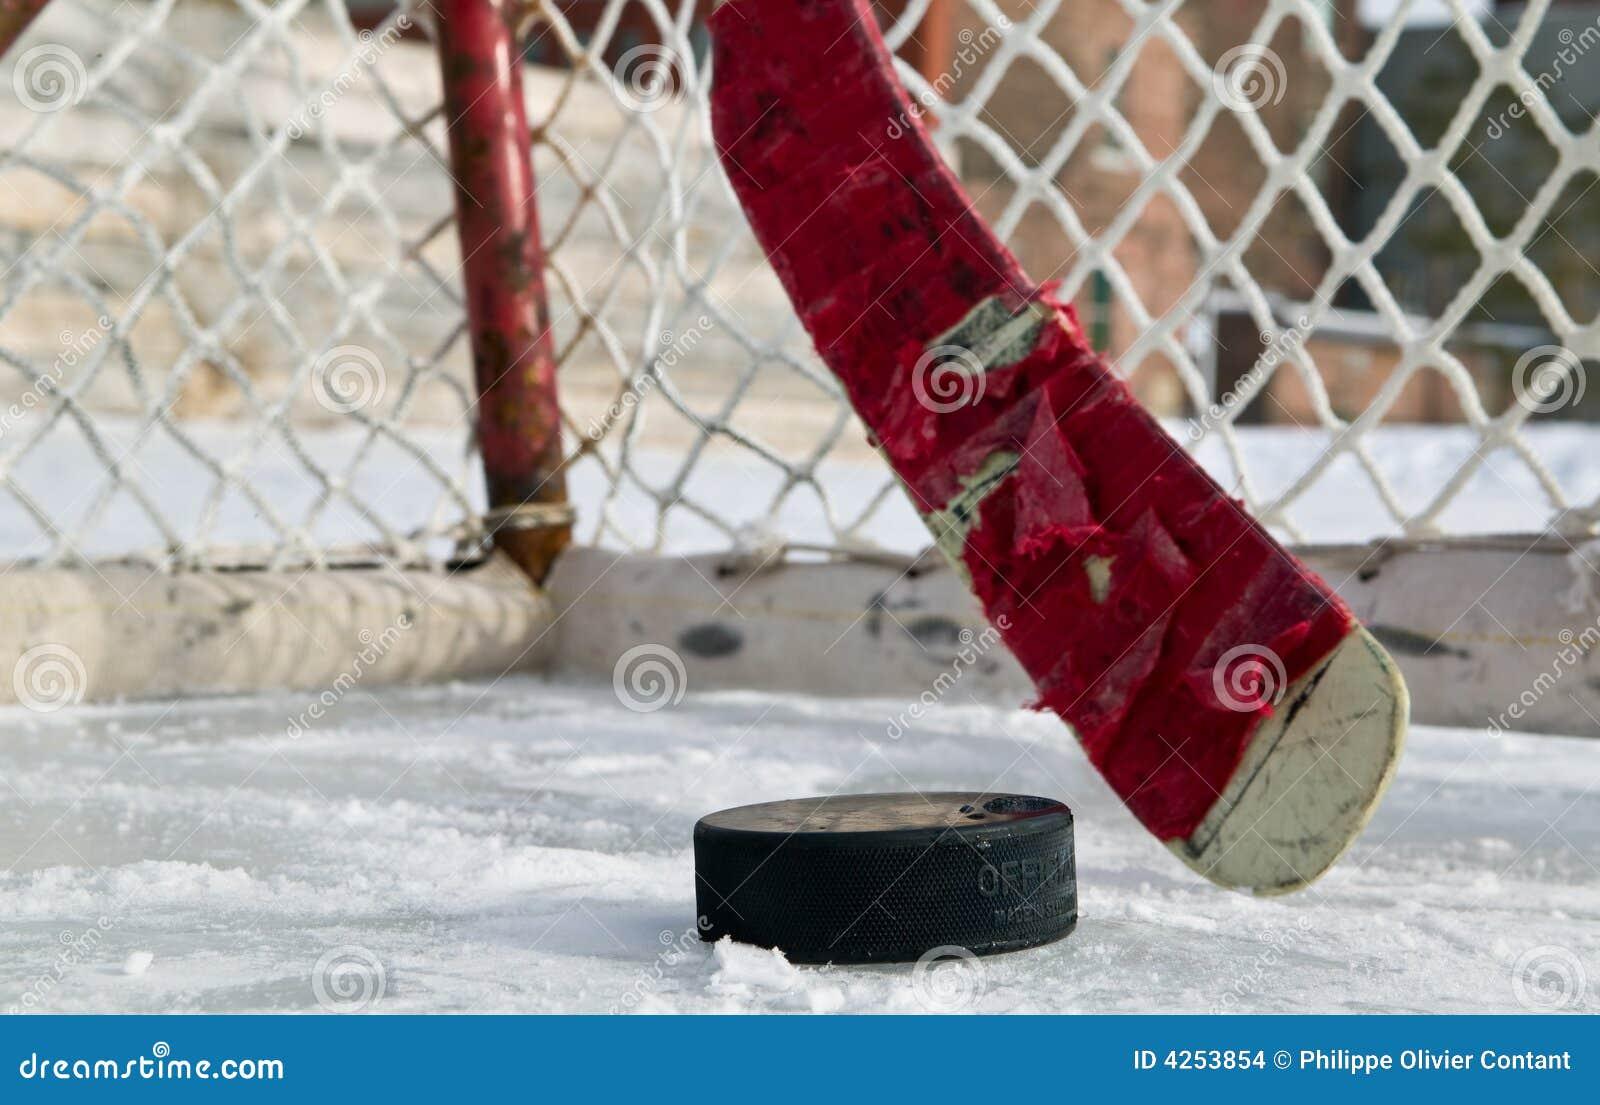 Winter Hockey